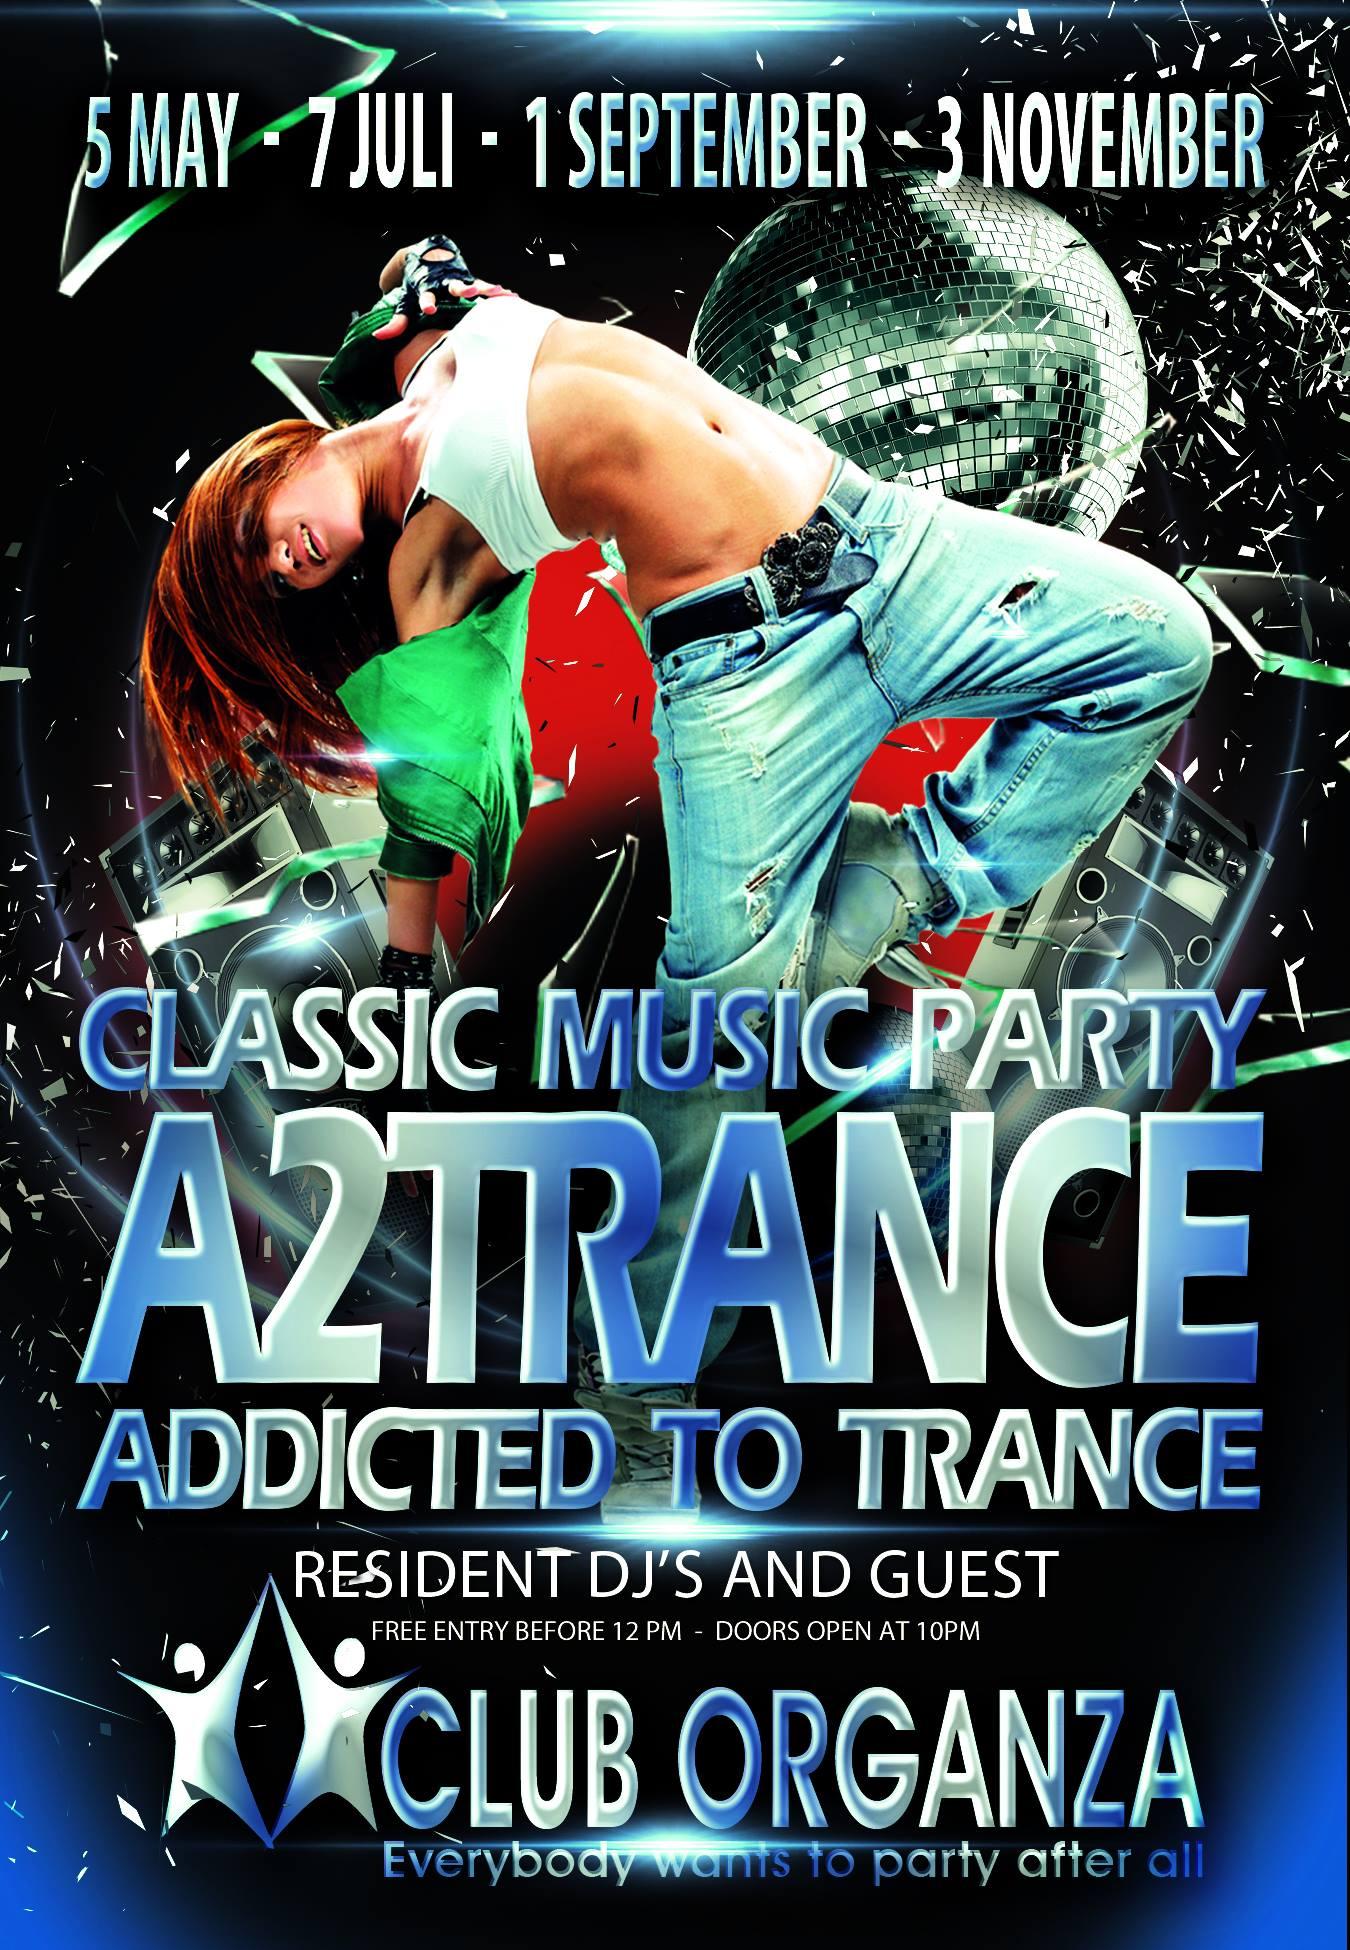 a2trance-n